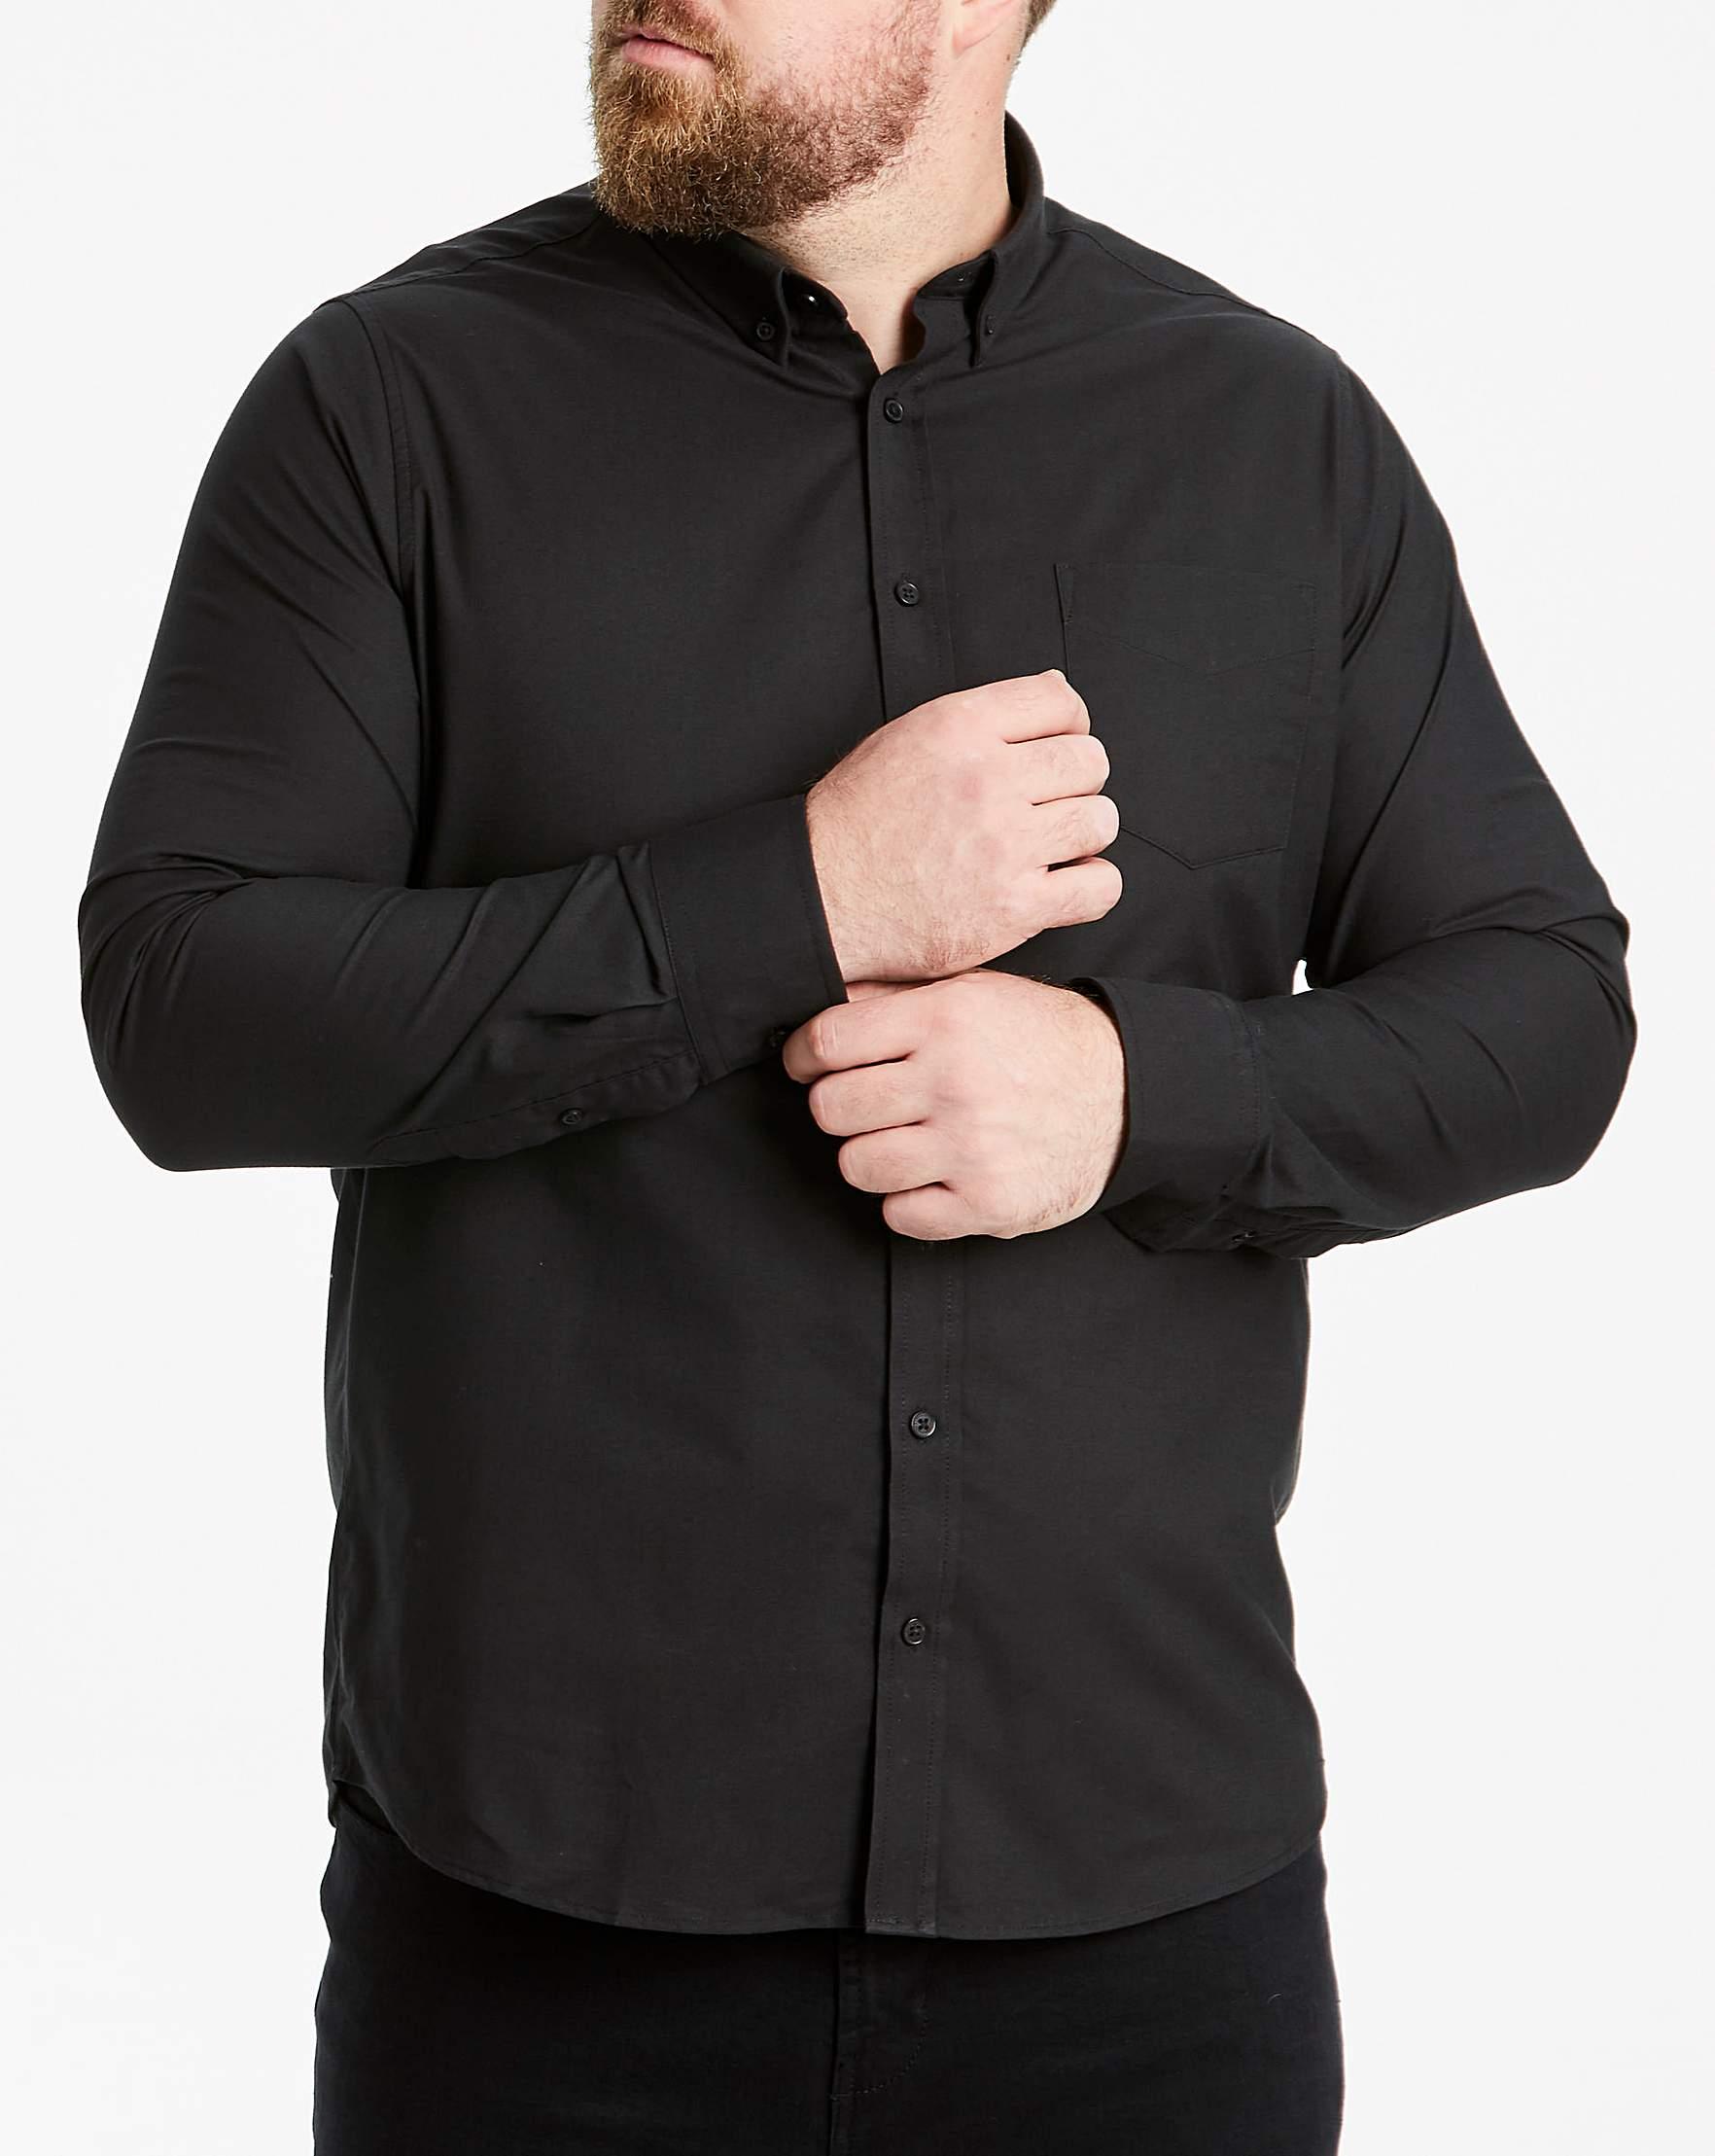 19e98213a94 Black Long Sleeve Oxford Shirt Long   Jacamo